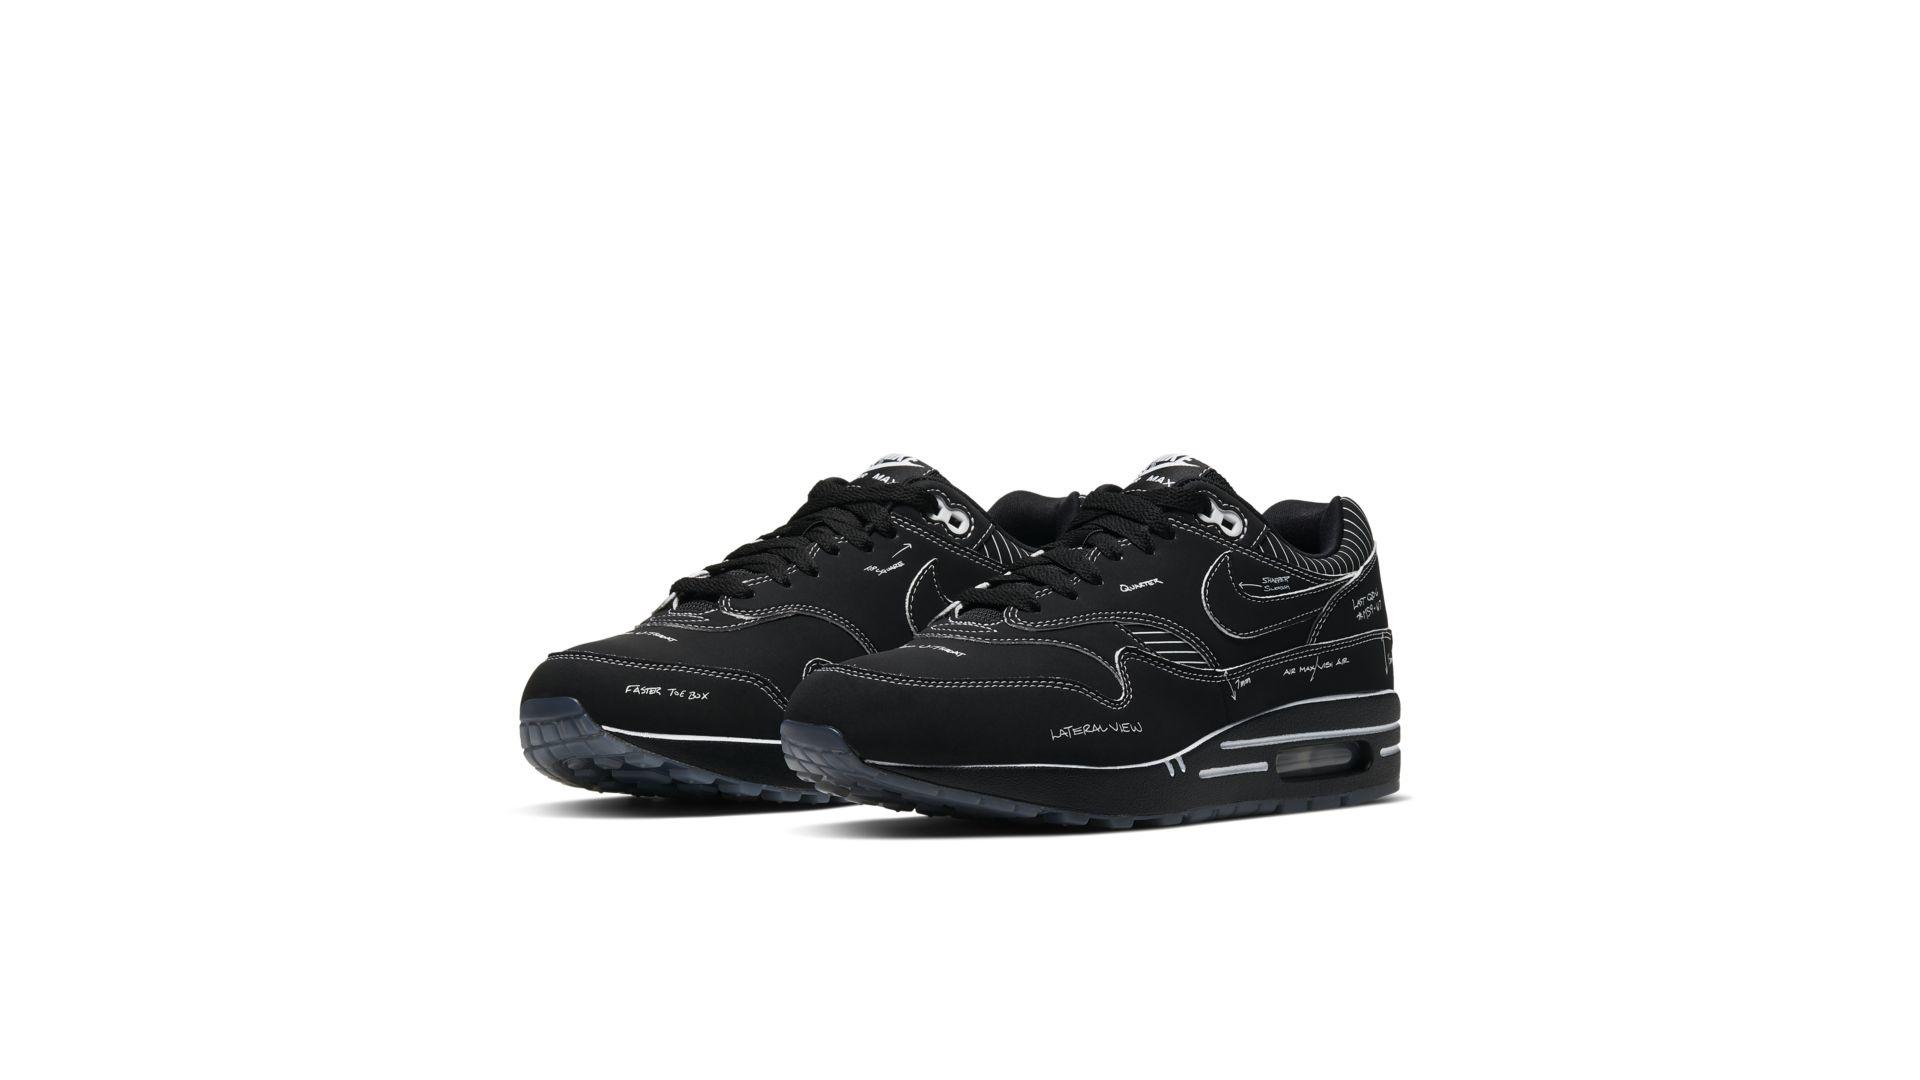 Nike Air Max 1 'Sketch To Shelf Black